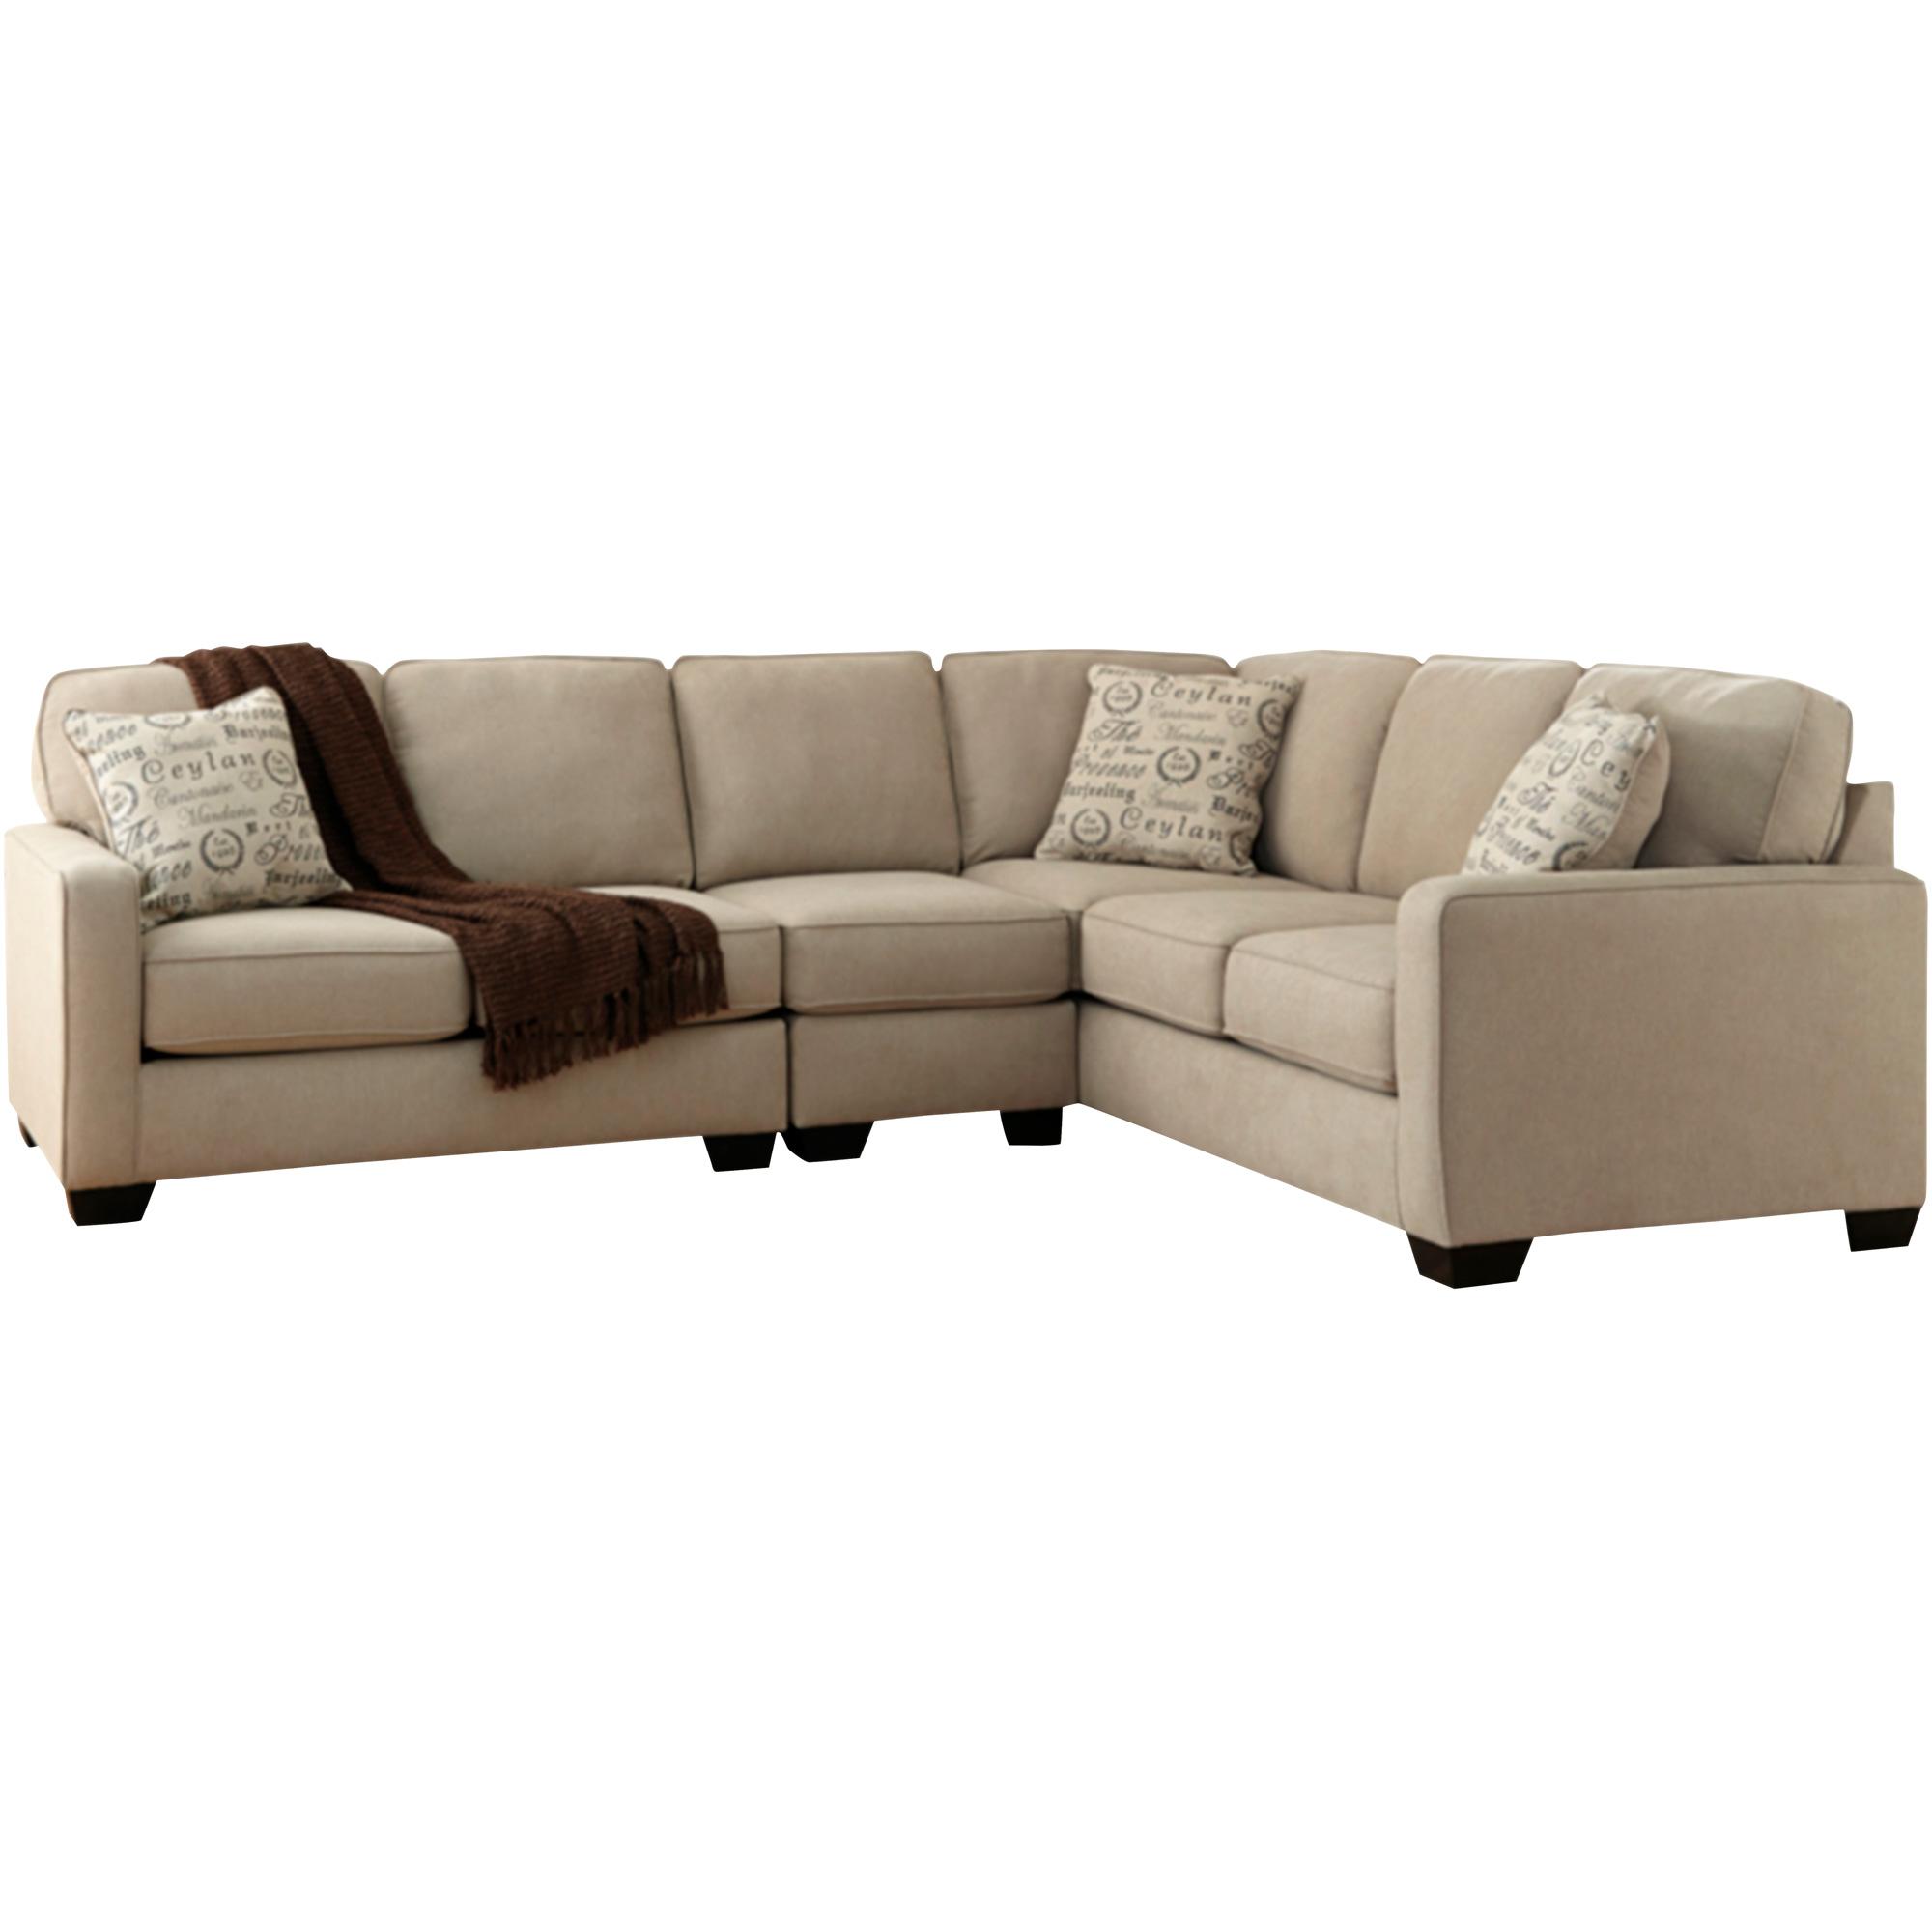 Ashley Furniture | Alenya Quartz 3 Piece Left Sectional Sofa